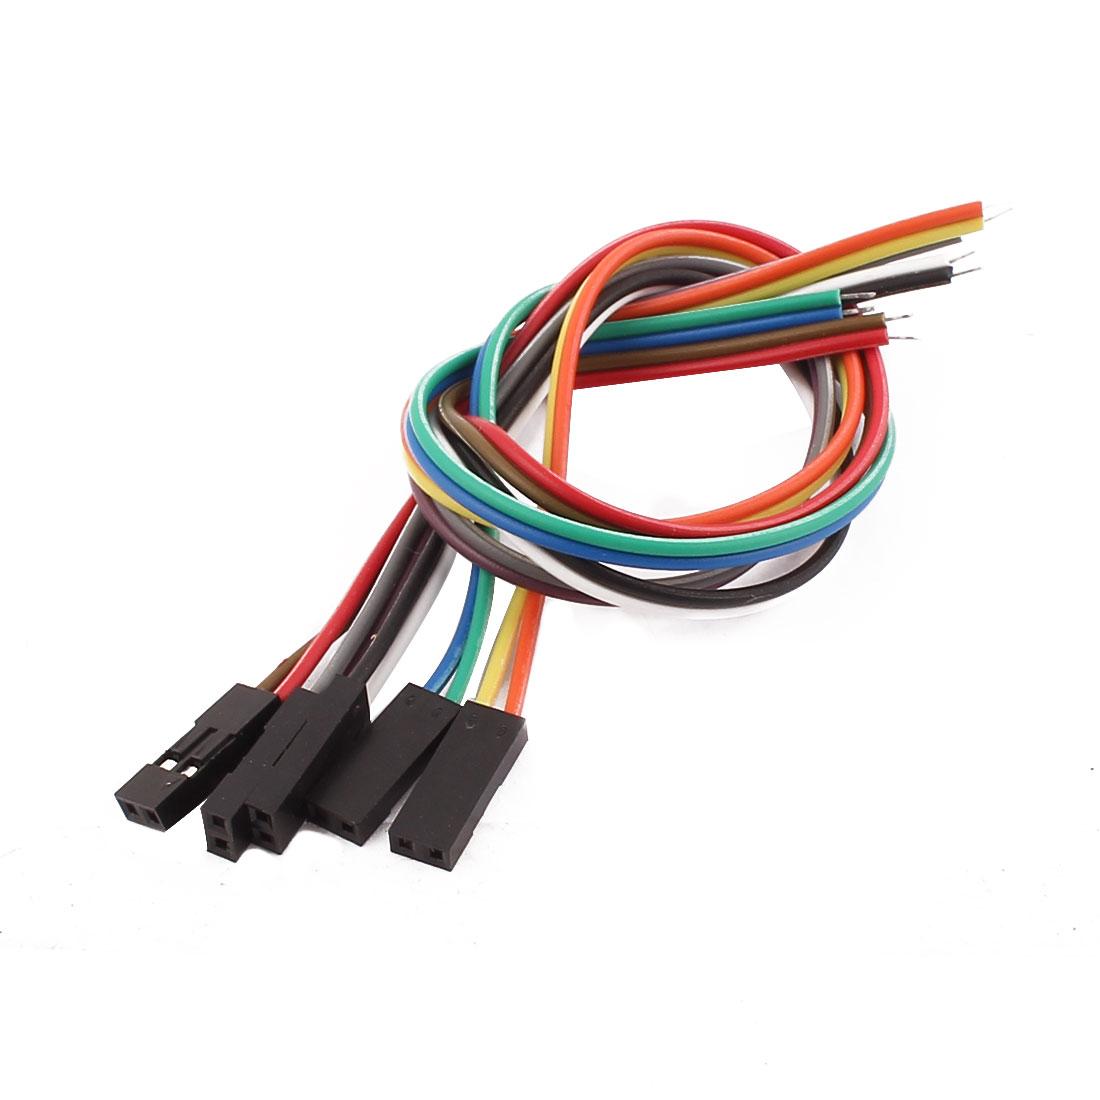 5 Pcs Female 2P Jumper Wires Ribbon Cables Pi Pic Breadboard DIY 20cm Long